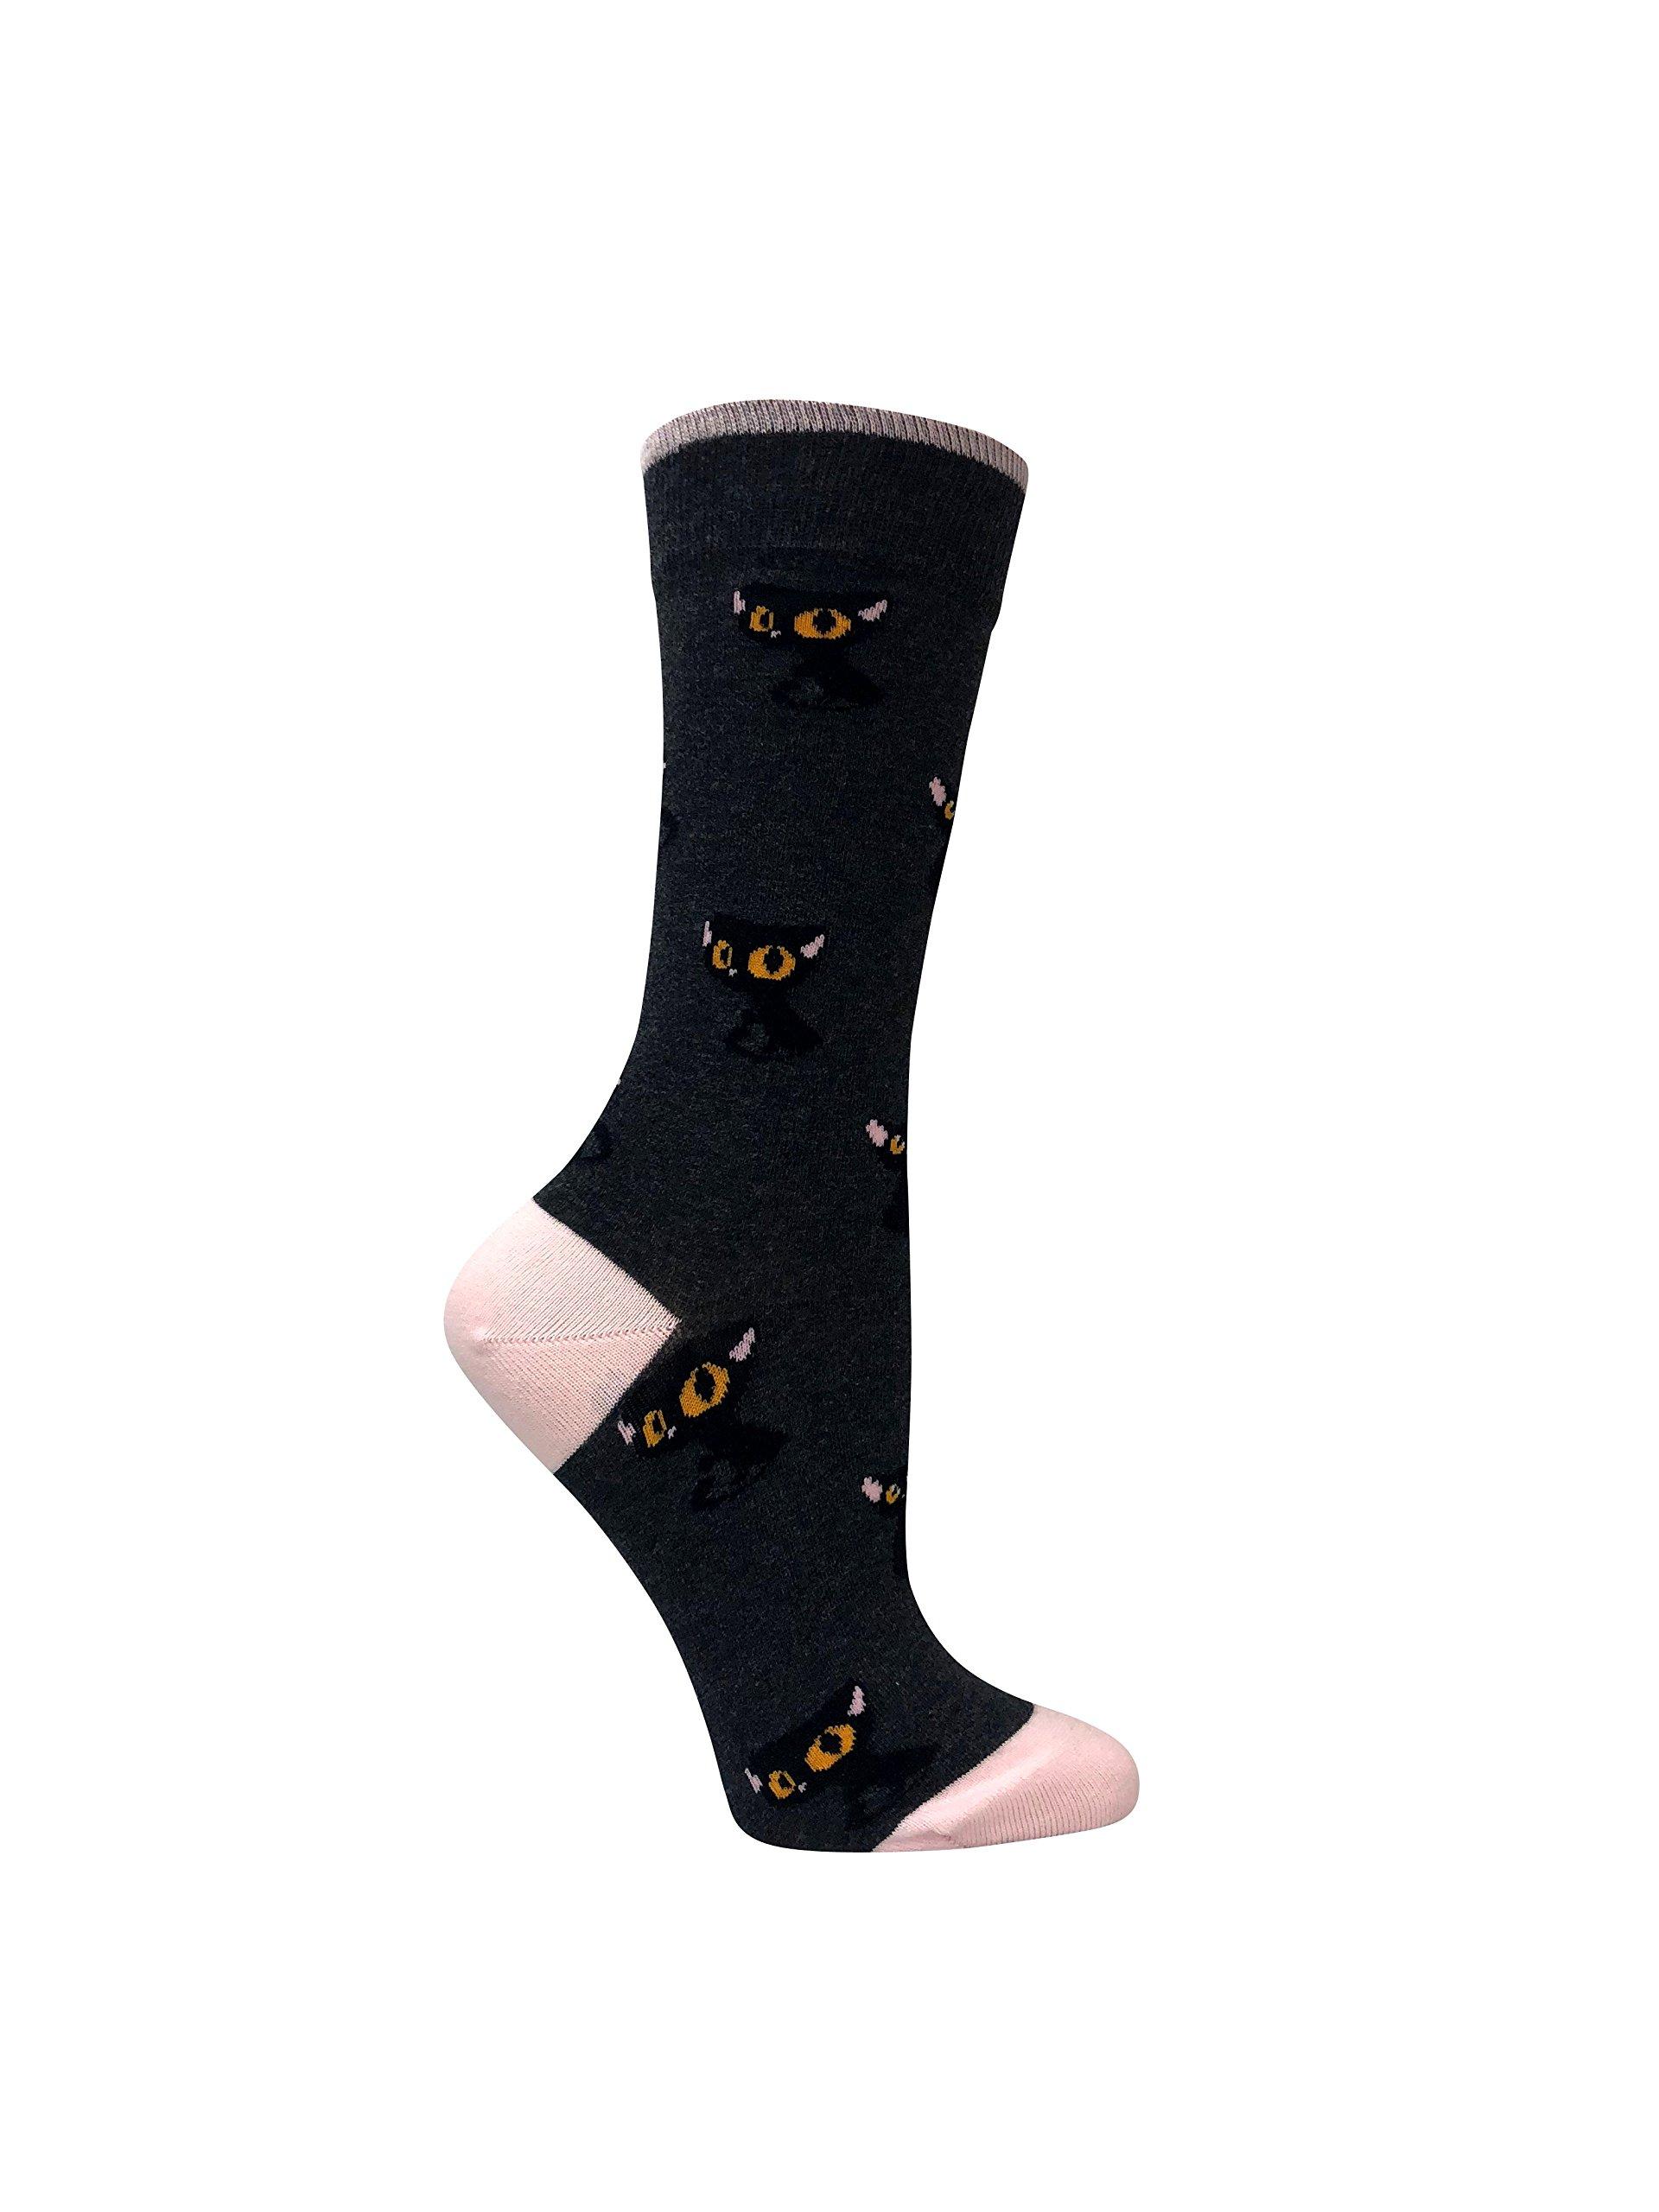 Cat Lover - Premium organic cotton women's gray crew sock with cats design.